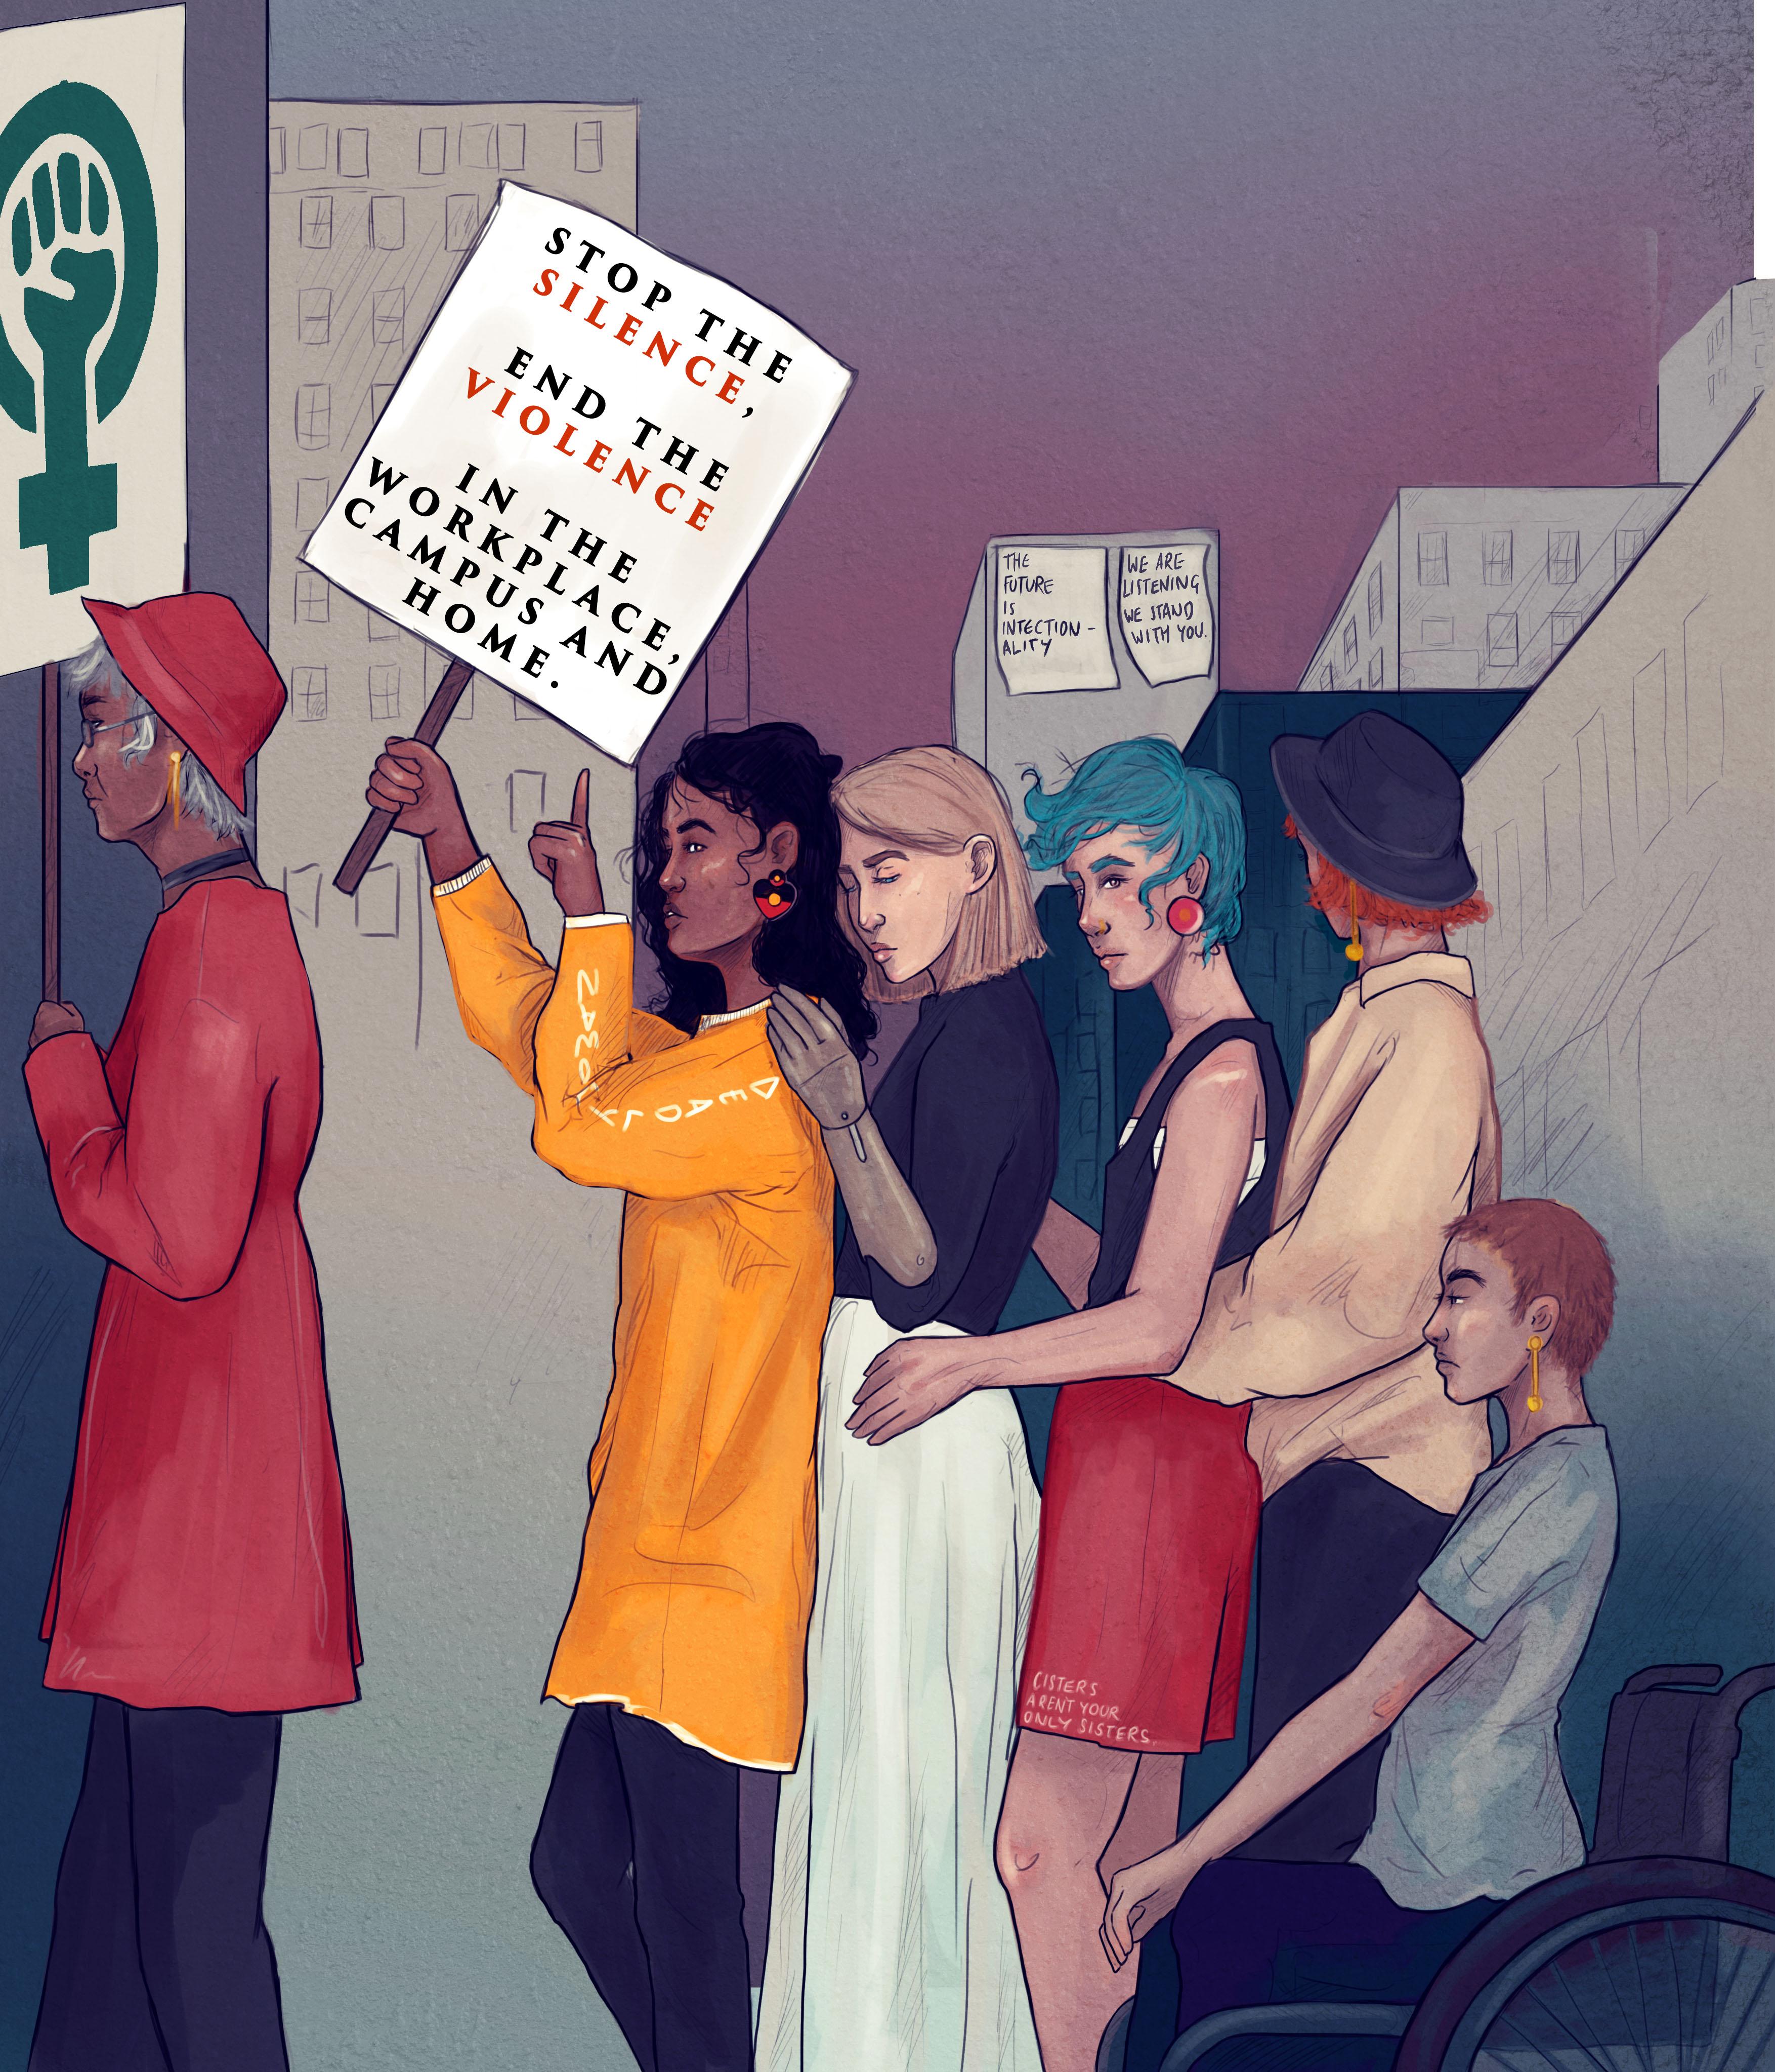 International Women's Day March 2018